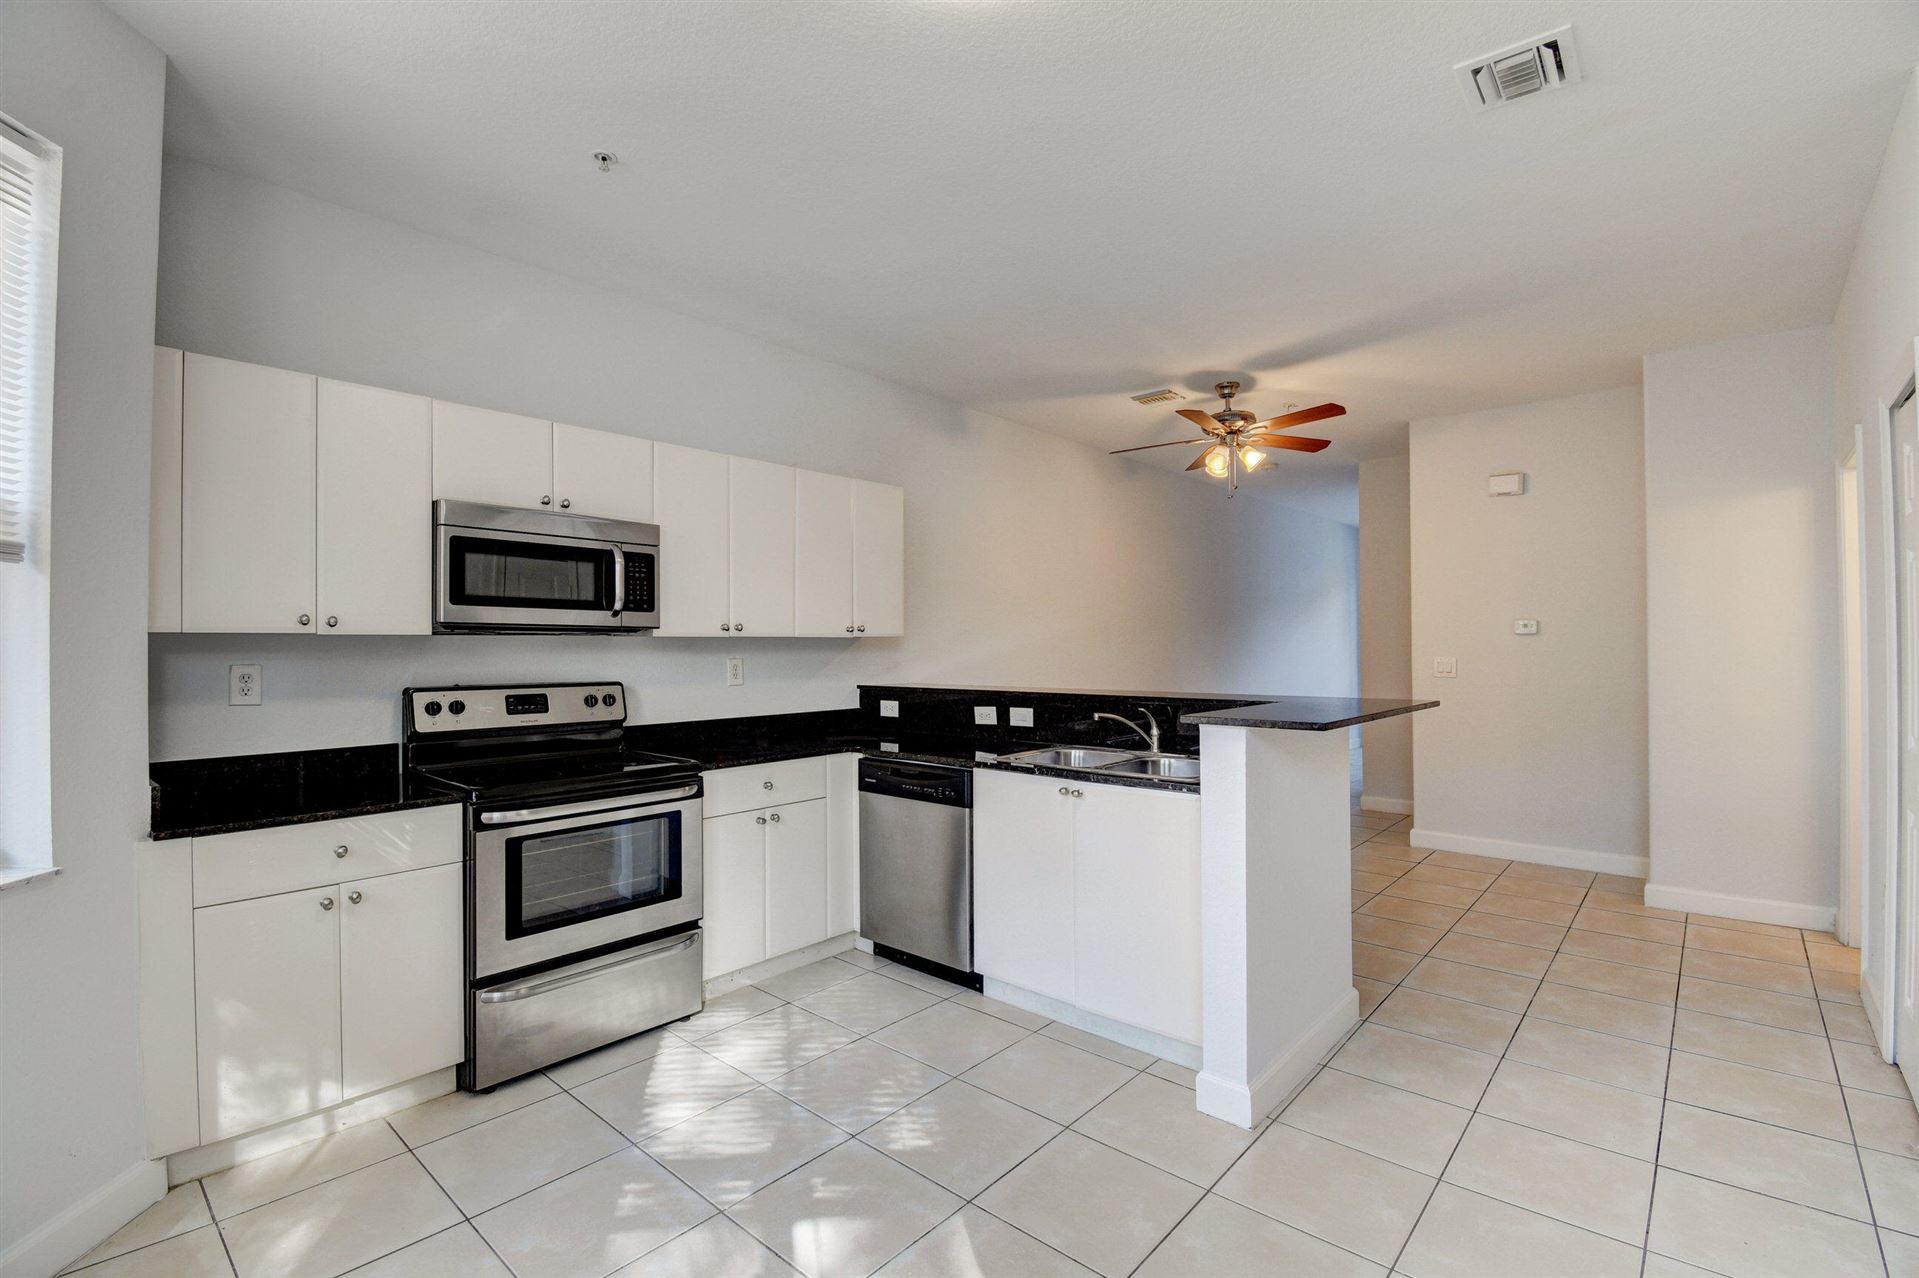 4002 Shoma Drive, Royal Palm Beach, FL 33414 - #: RX-10638219